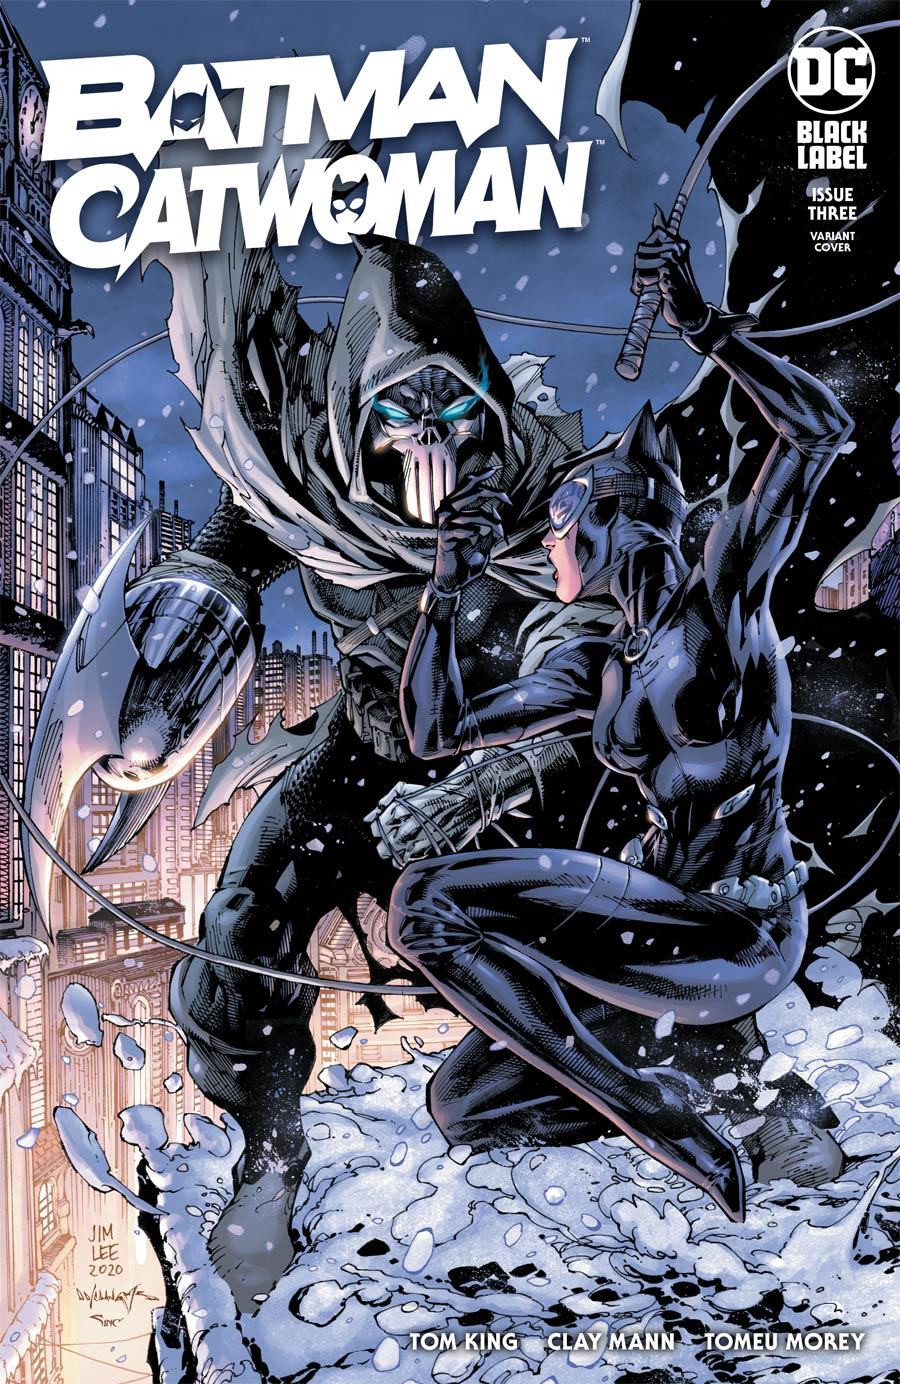 Batman Catwoman #3 Cover B Variant Jim Lee & Scott Williams Cover